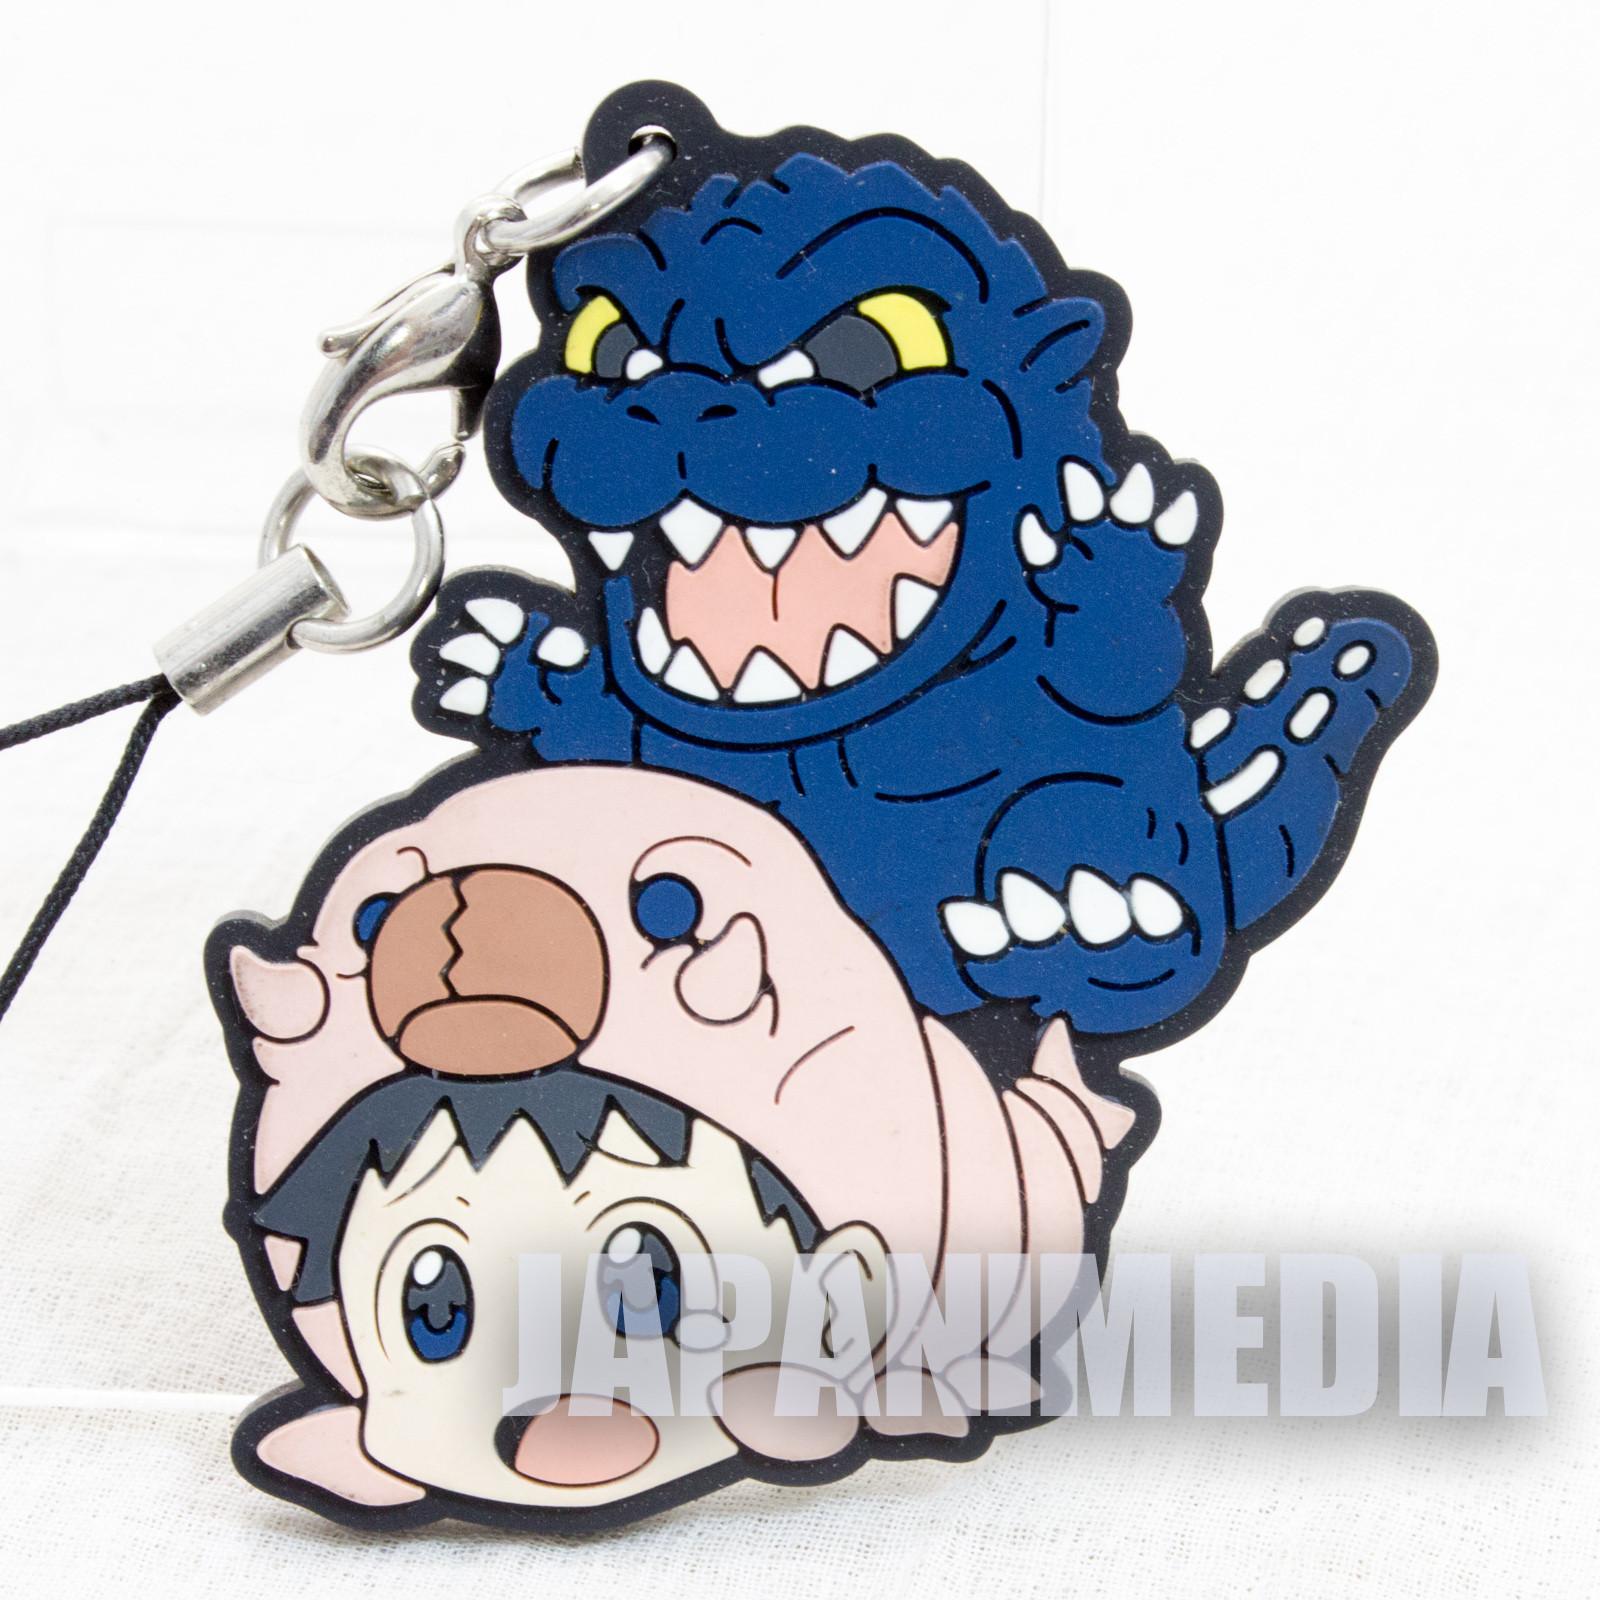 Evangelion Shinji Ikari x Godzilla Mascot Rubber Strap JAPAN